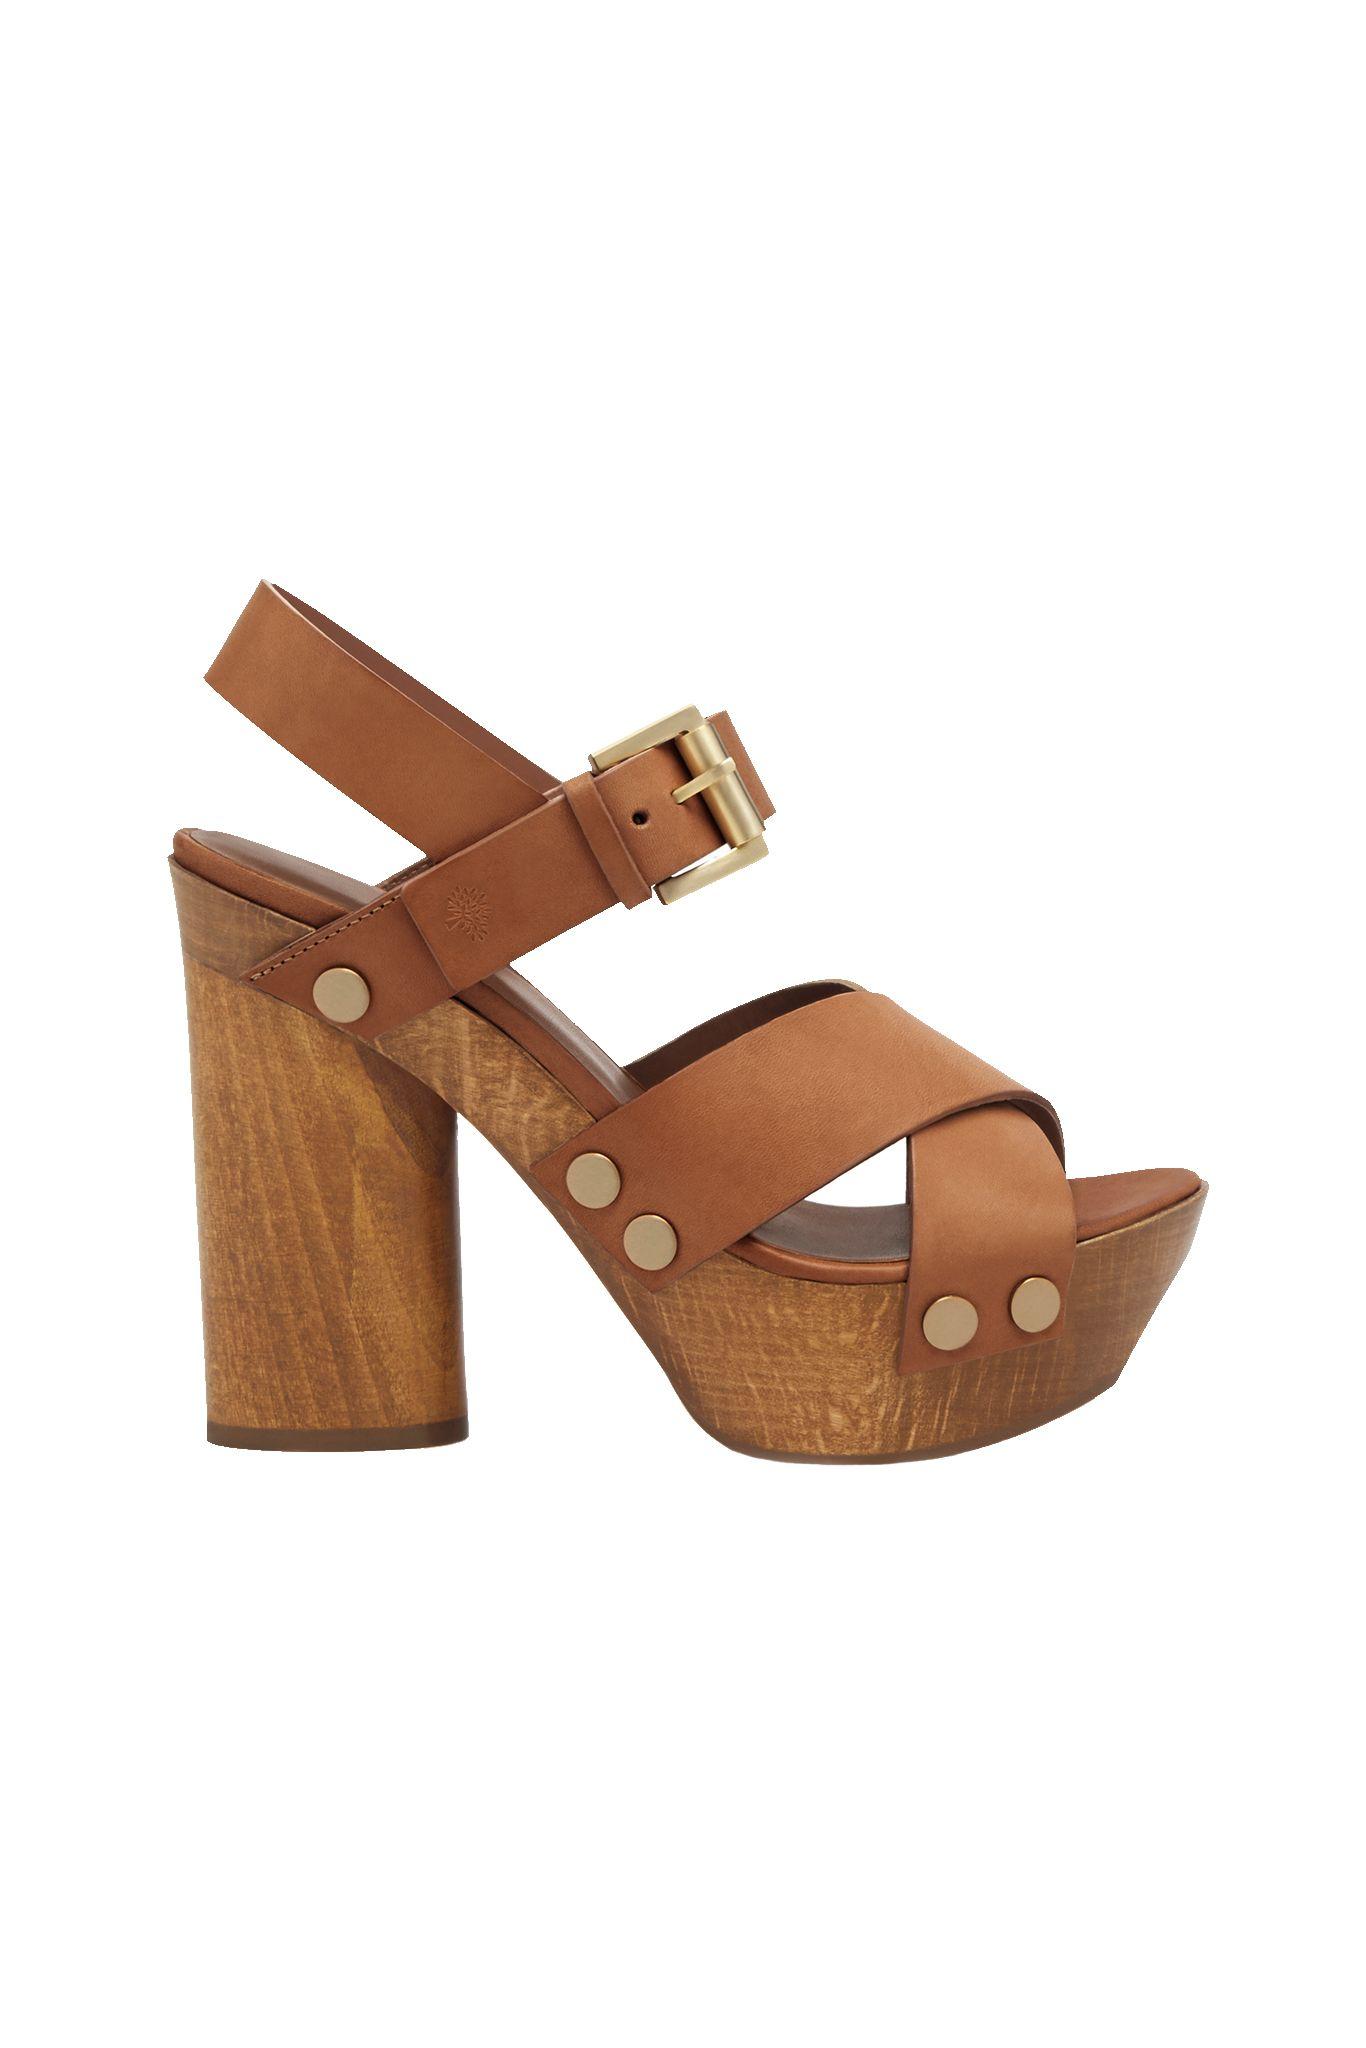 Accessory Report: Platform Sandals